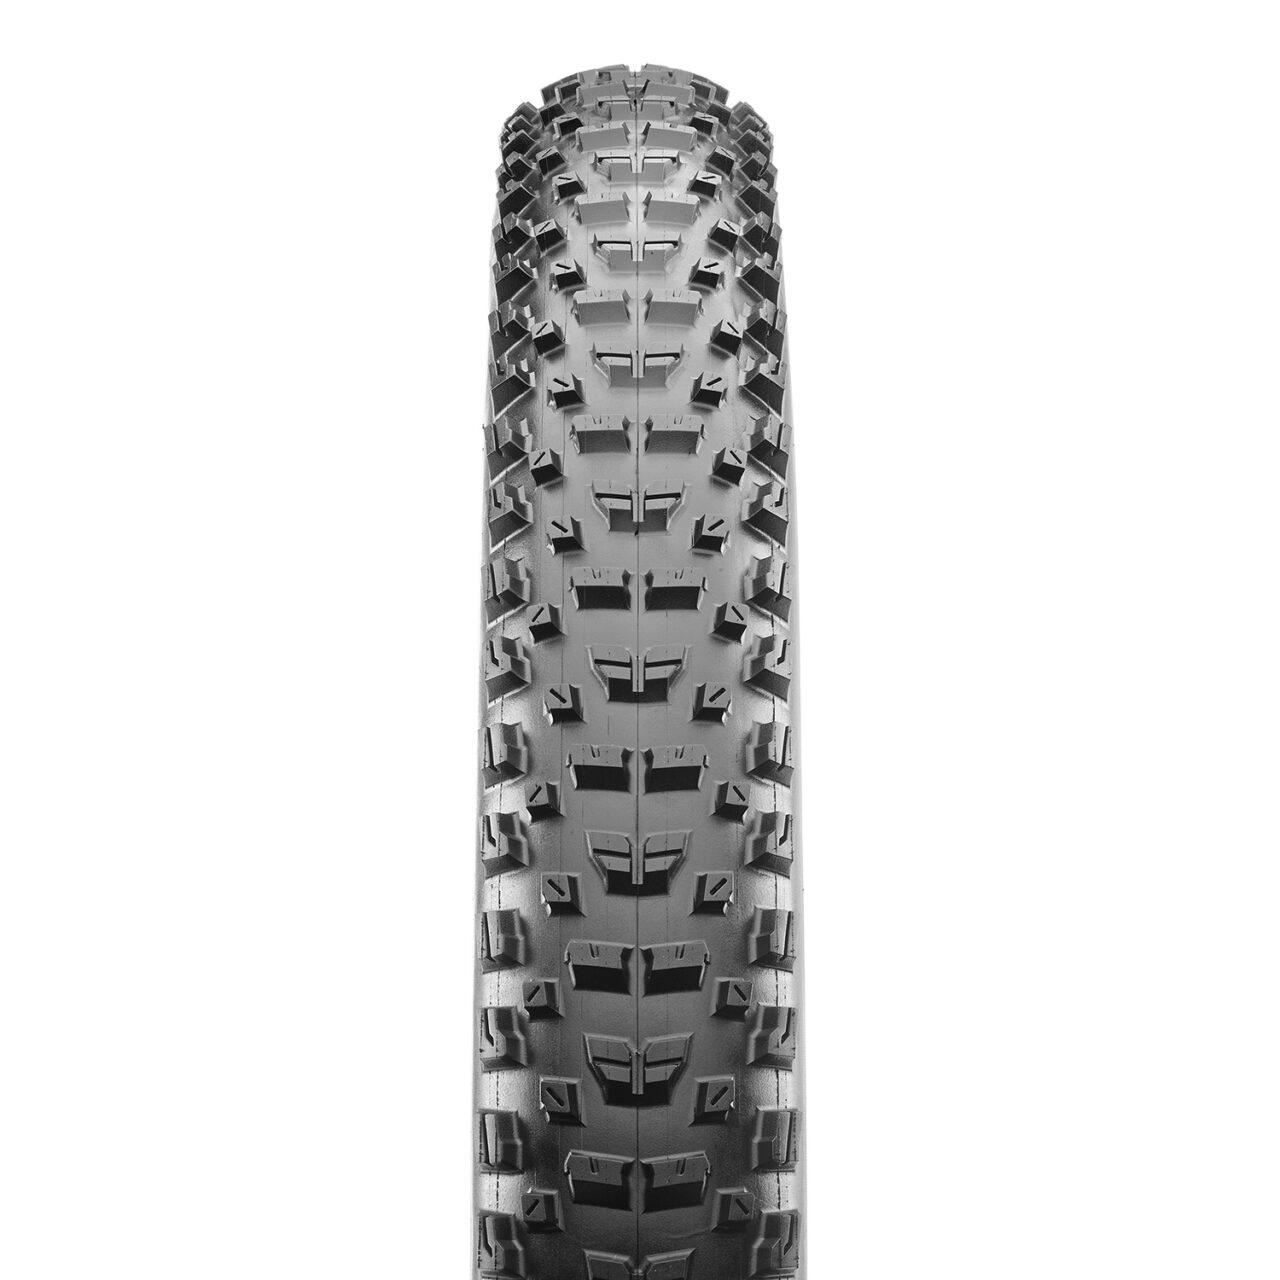 Maxxis Rekon bicycle tire tread